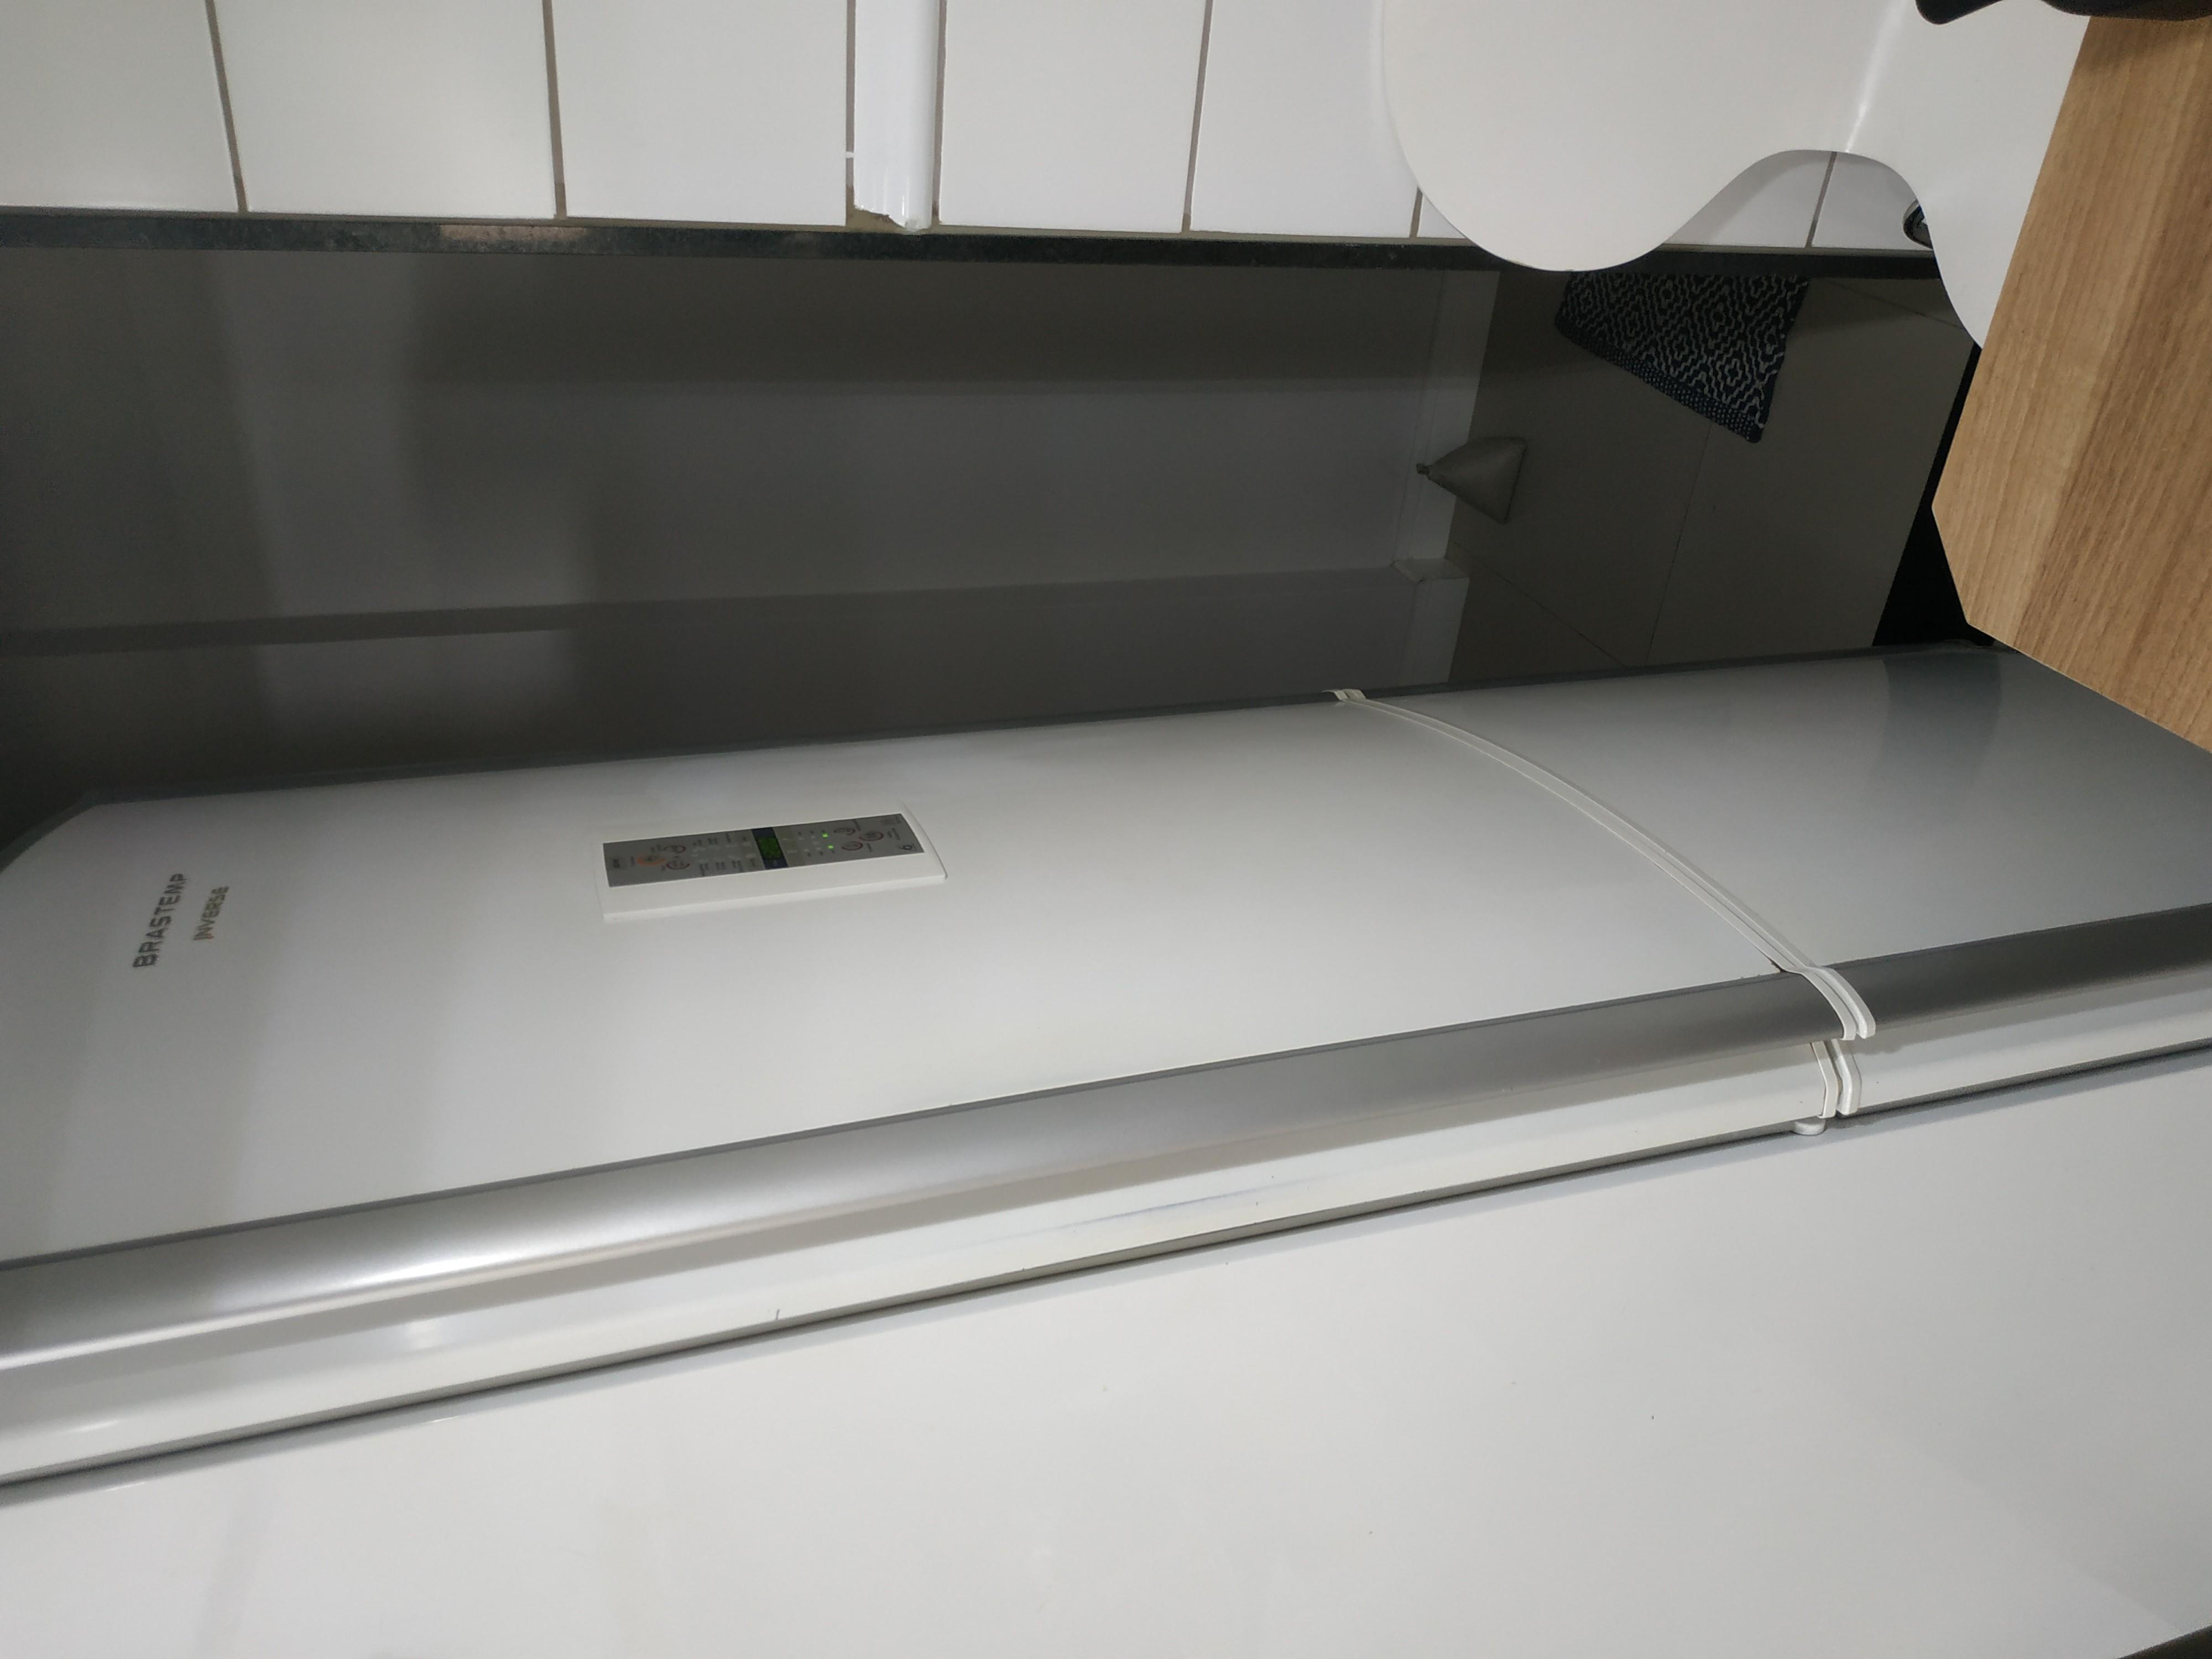 Refrigerador Geladeira Brastemp BRE49 Inverse 425lts branca